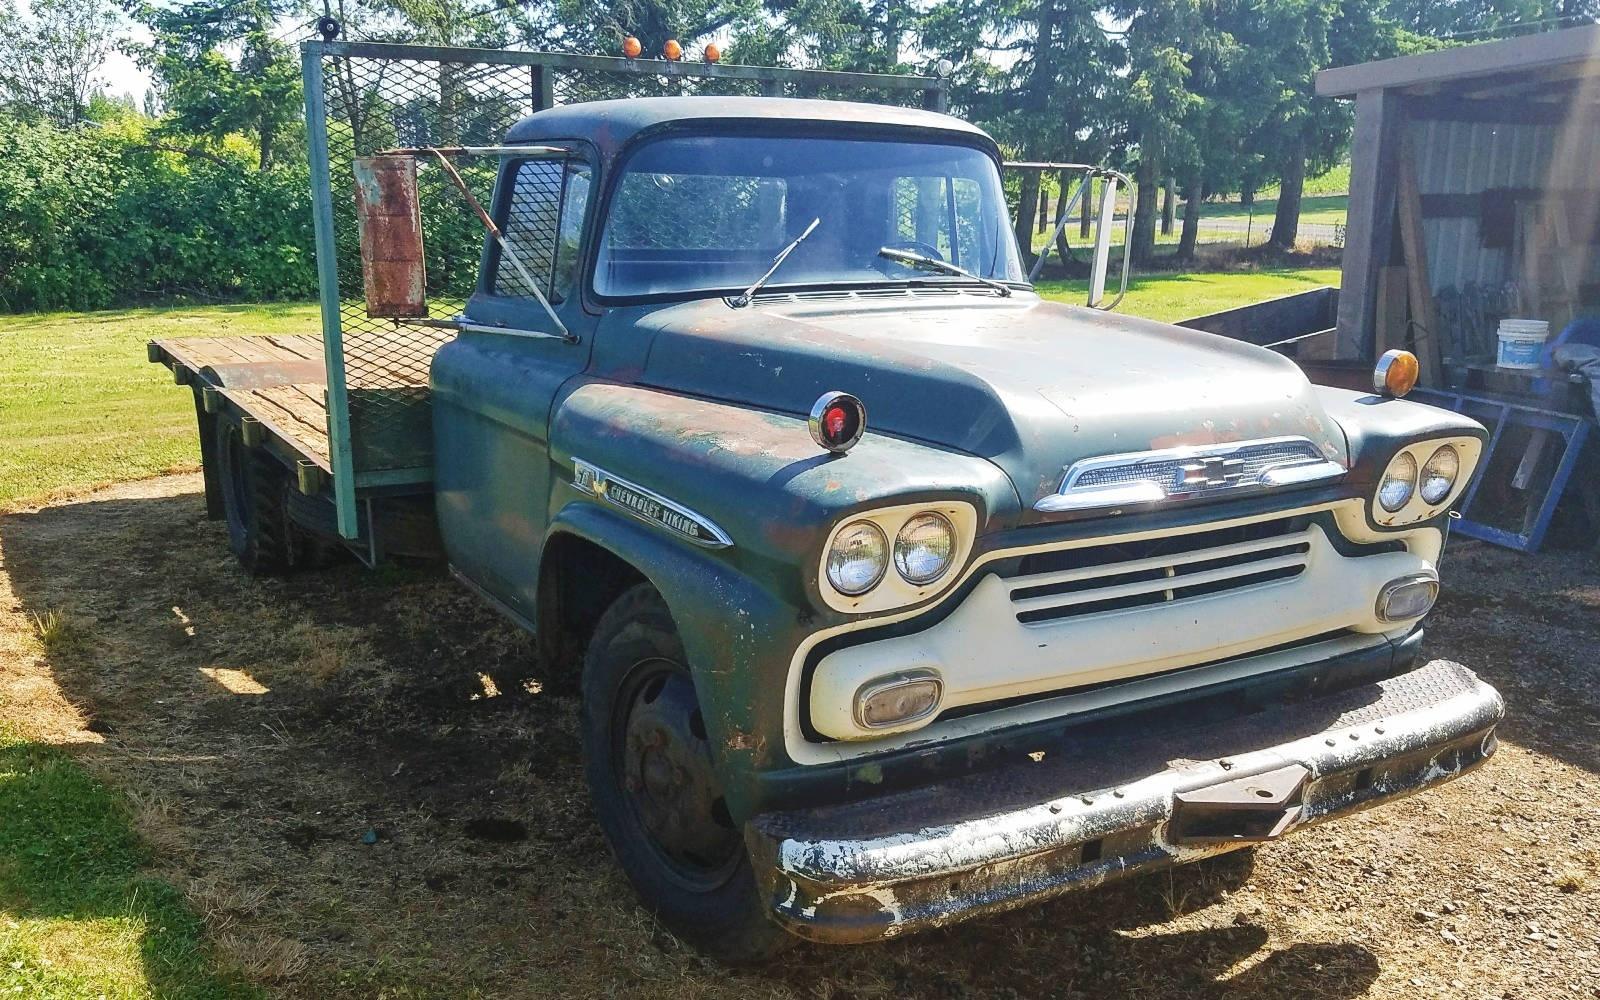 EXCLUSIVE: 1959 Chevrolet Viking